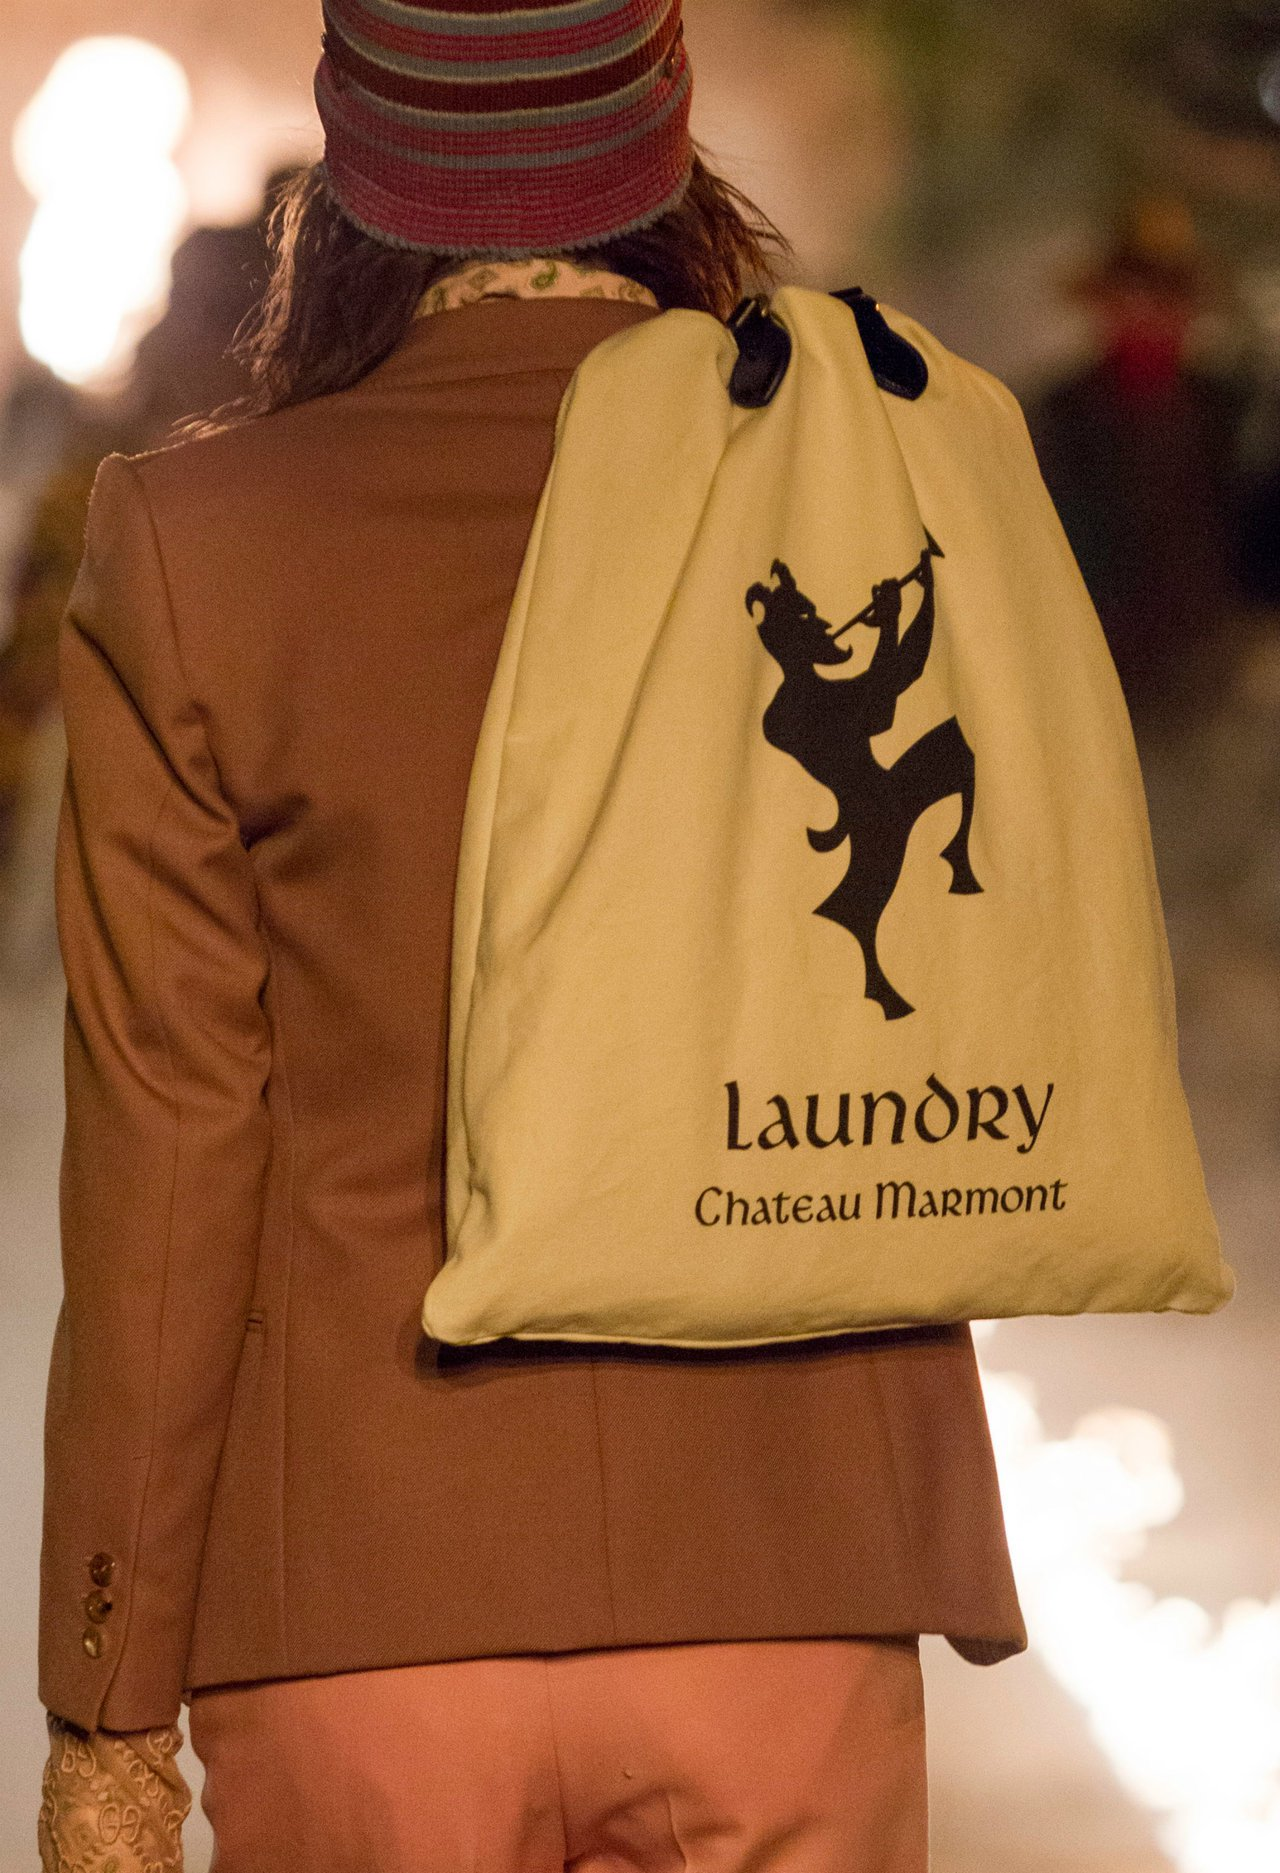 Gucci 2019早春系列中聚焦美國洛杉磯知名飯店Chateau Marmon...